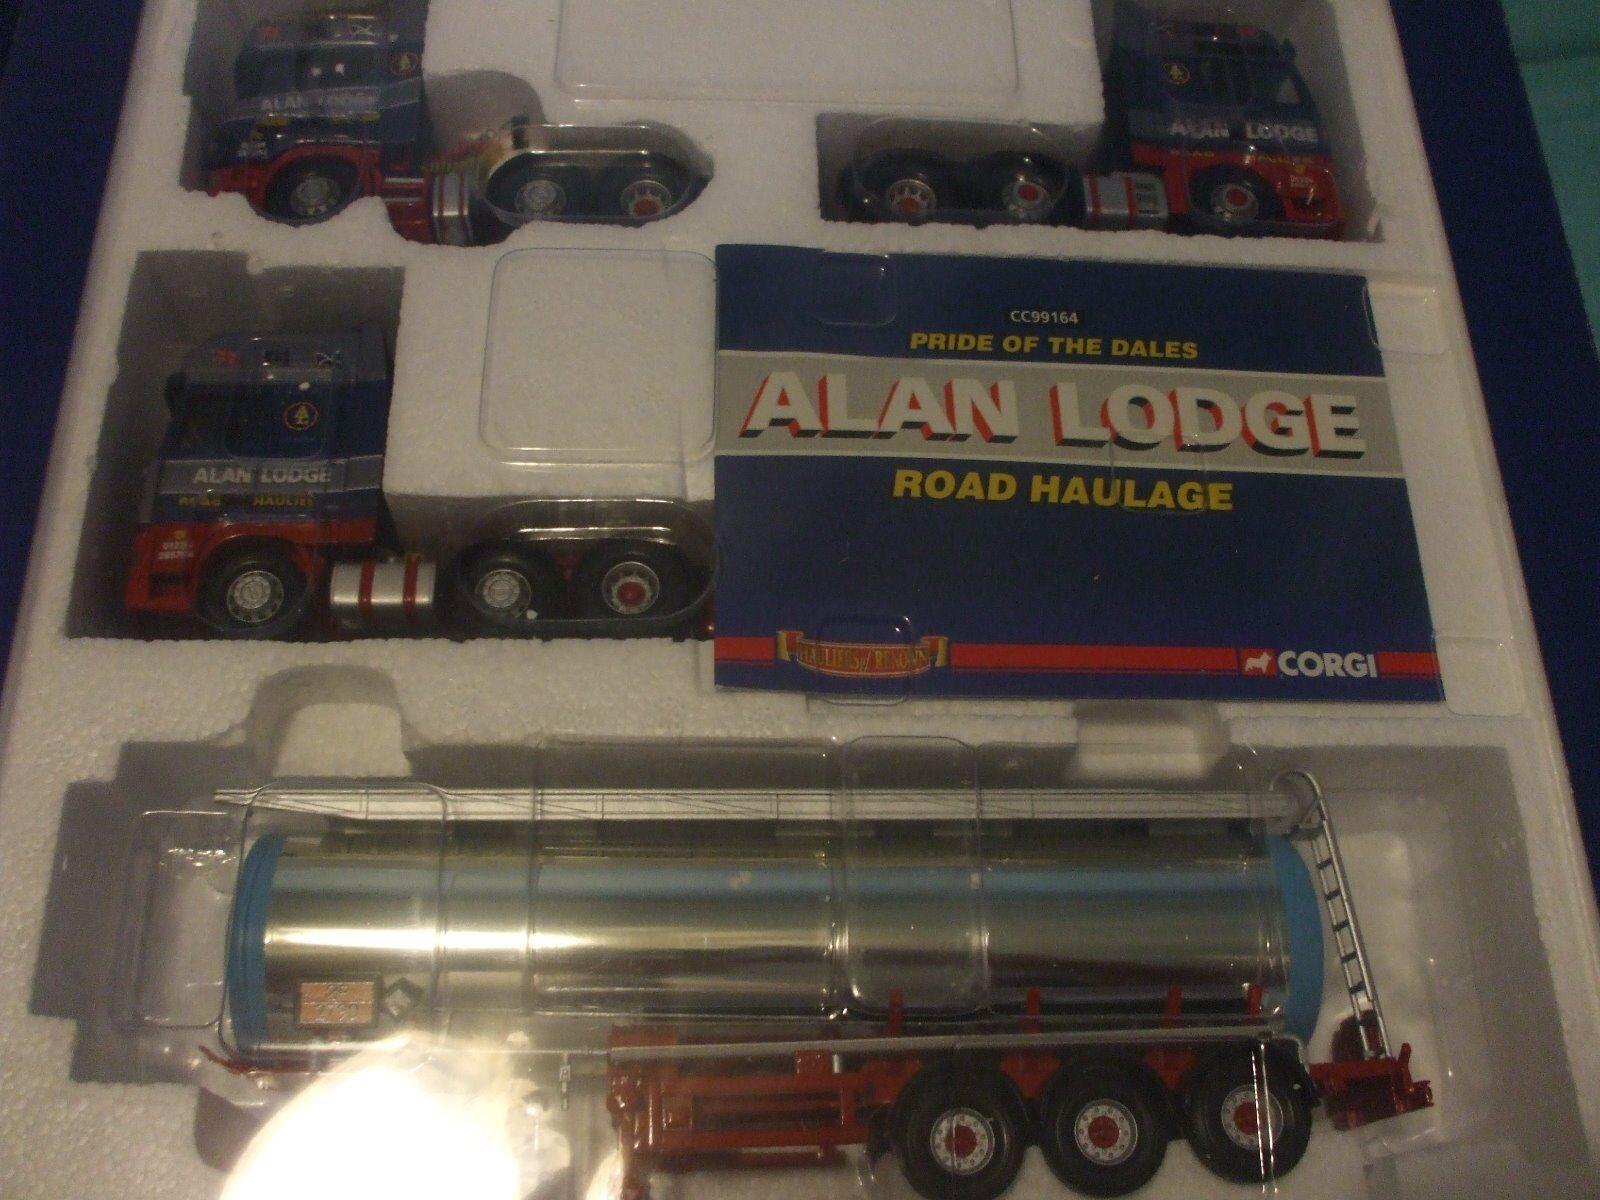 Corgi Box Set. -CC99164. Alan Lodge 1 50th Scale Diecast Set.